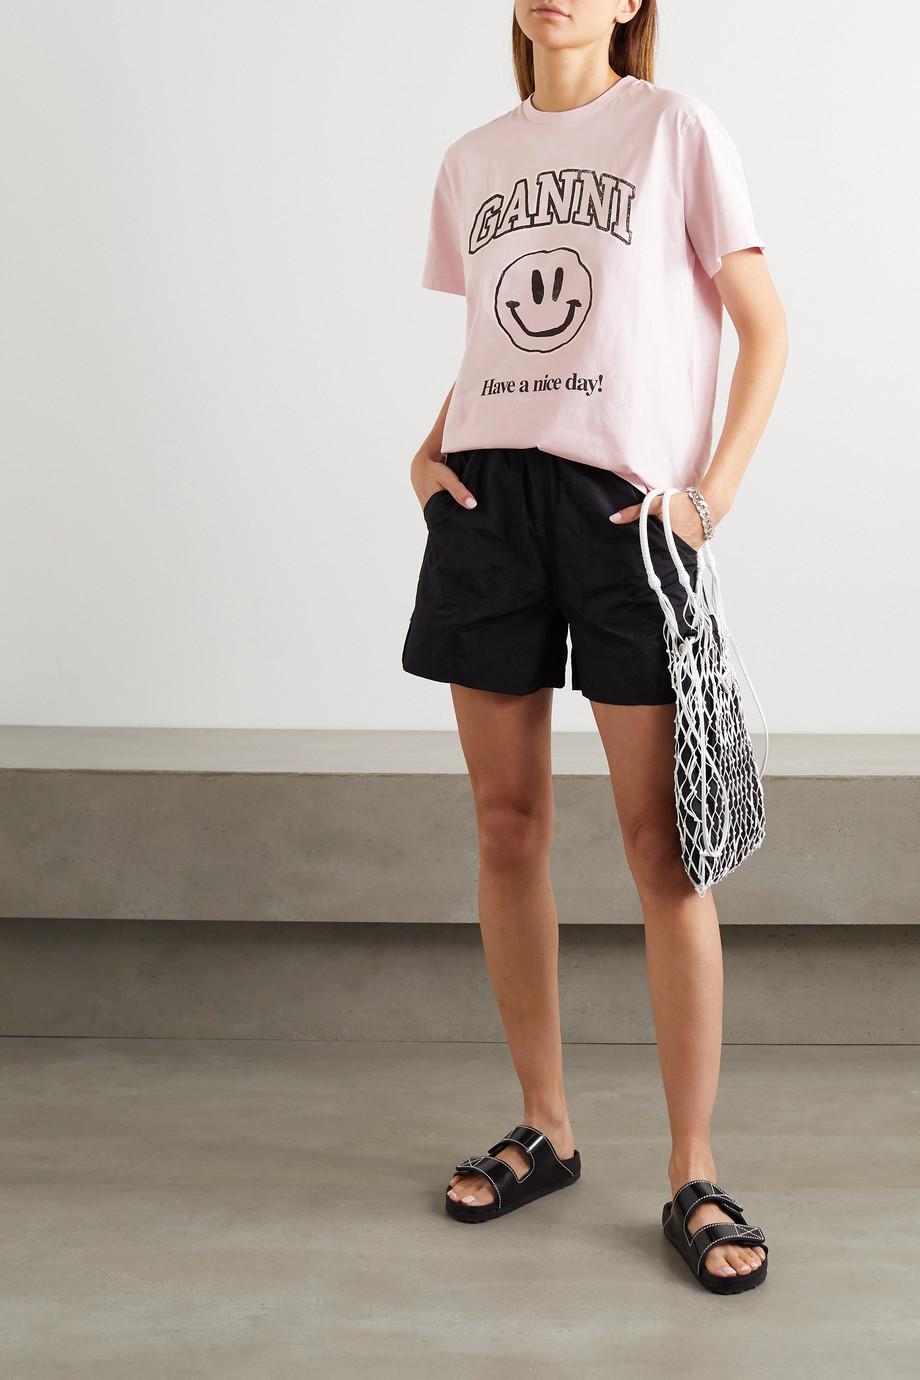 GANNI + NET SUSTAIN printed organic cotton-jersey T-shirt